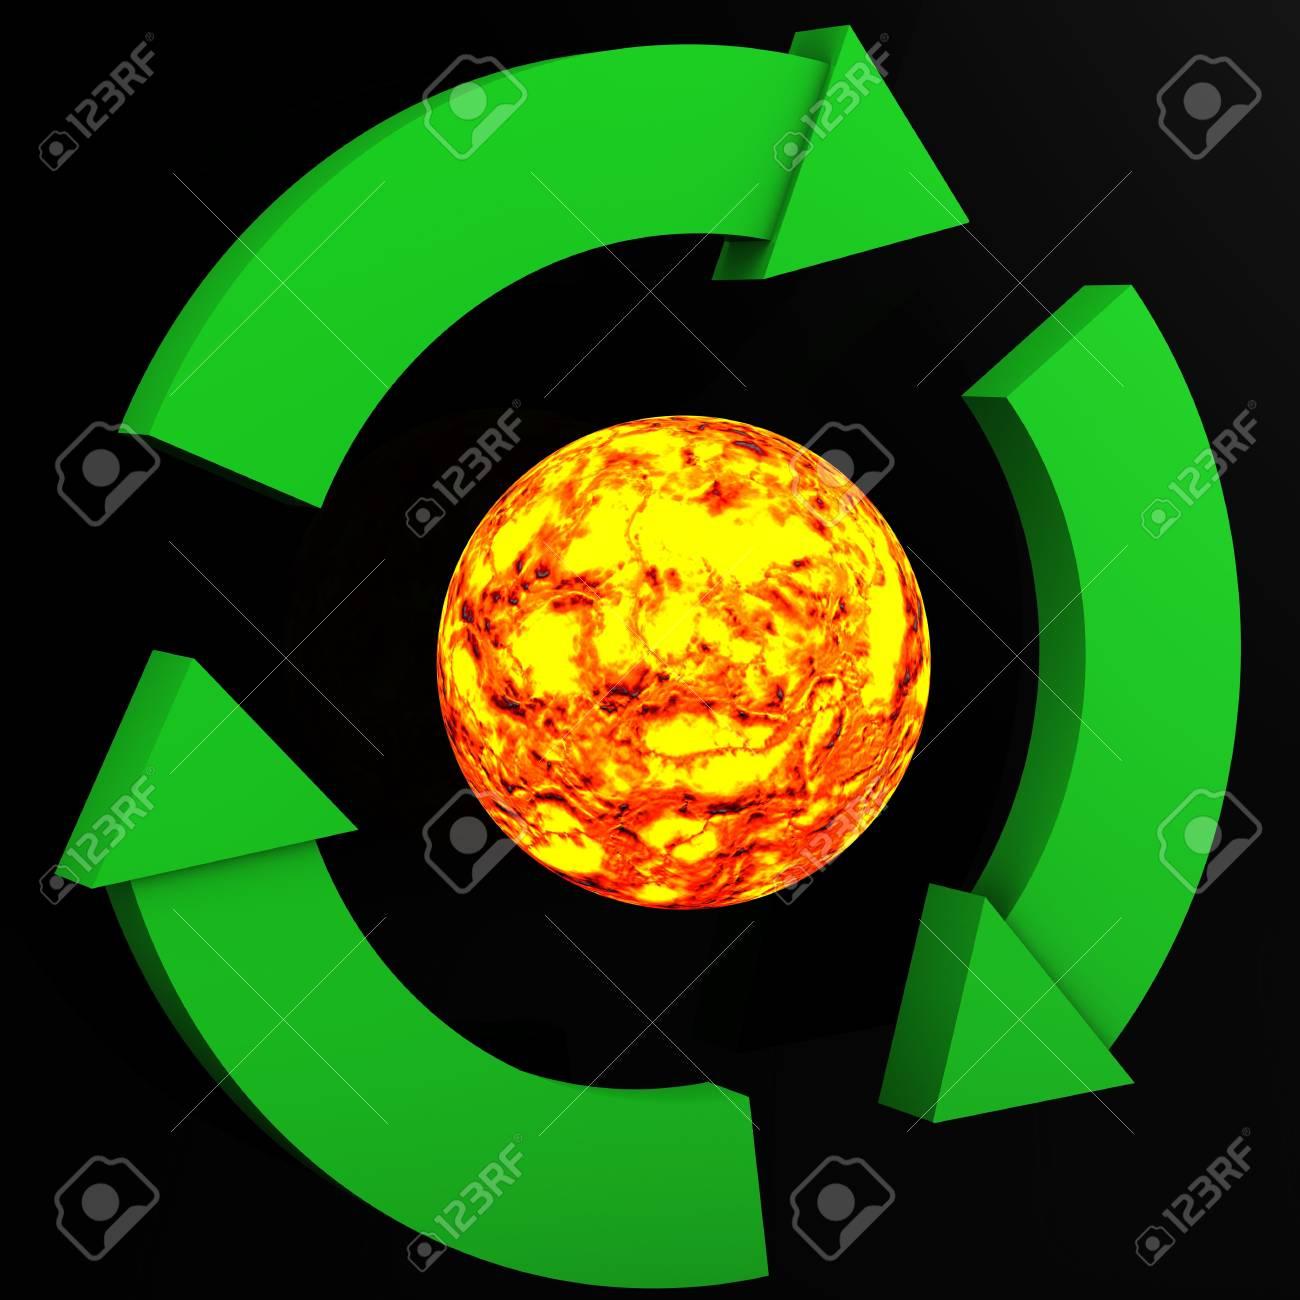 Environmetal sign surrounding sun on black background Stock Photo - 5047998